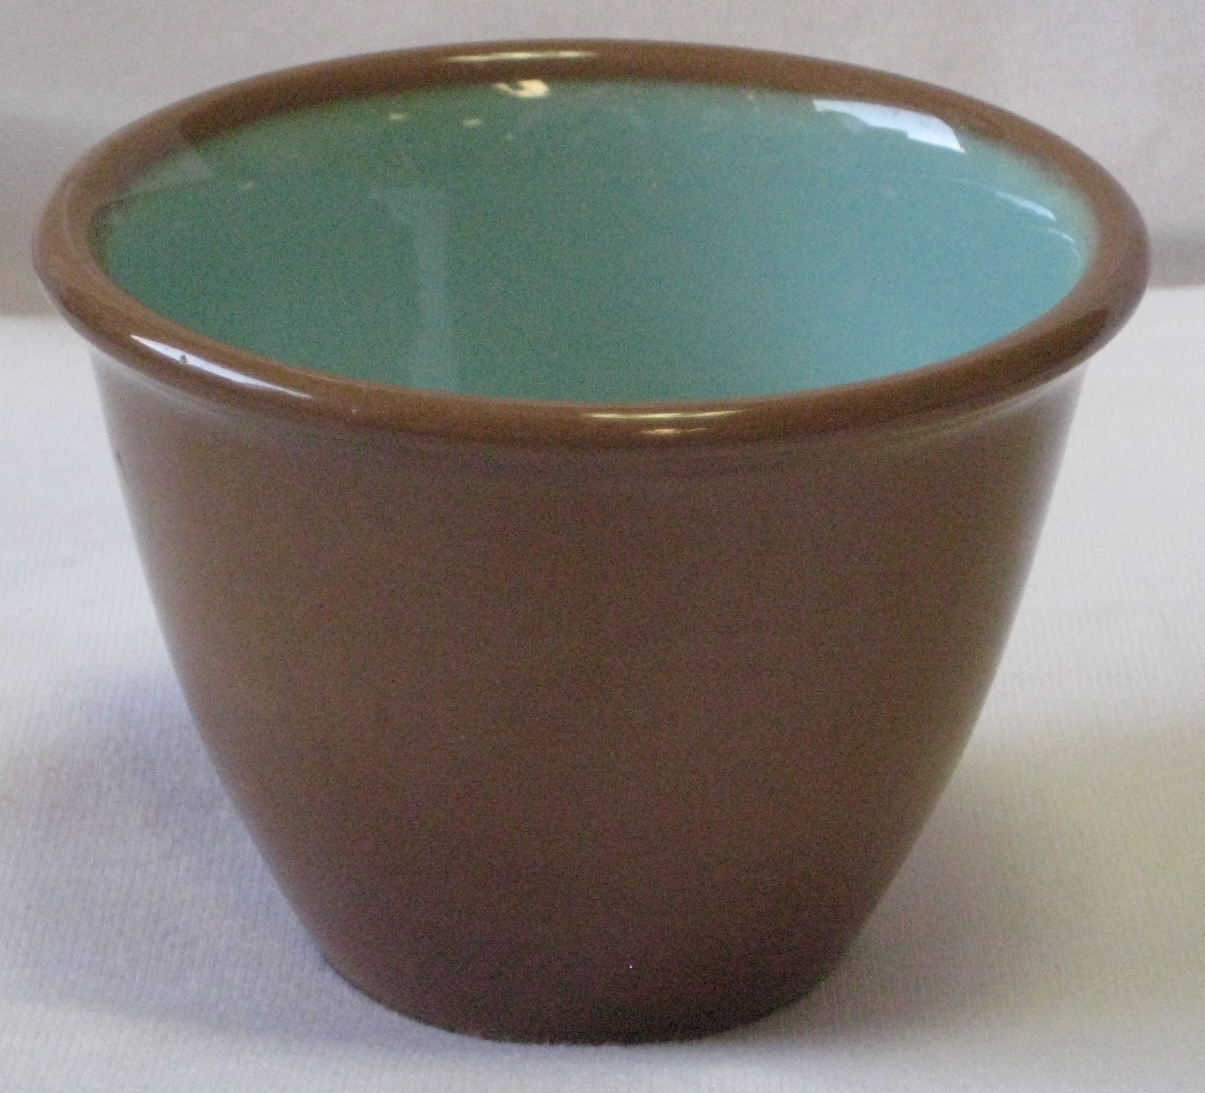 Taylor Smith Taylor Chateau Buffet Ramekin/Custard Cup-USA Turquoise/Cinnamon